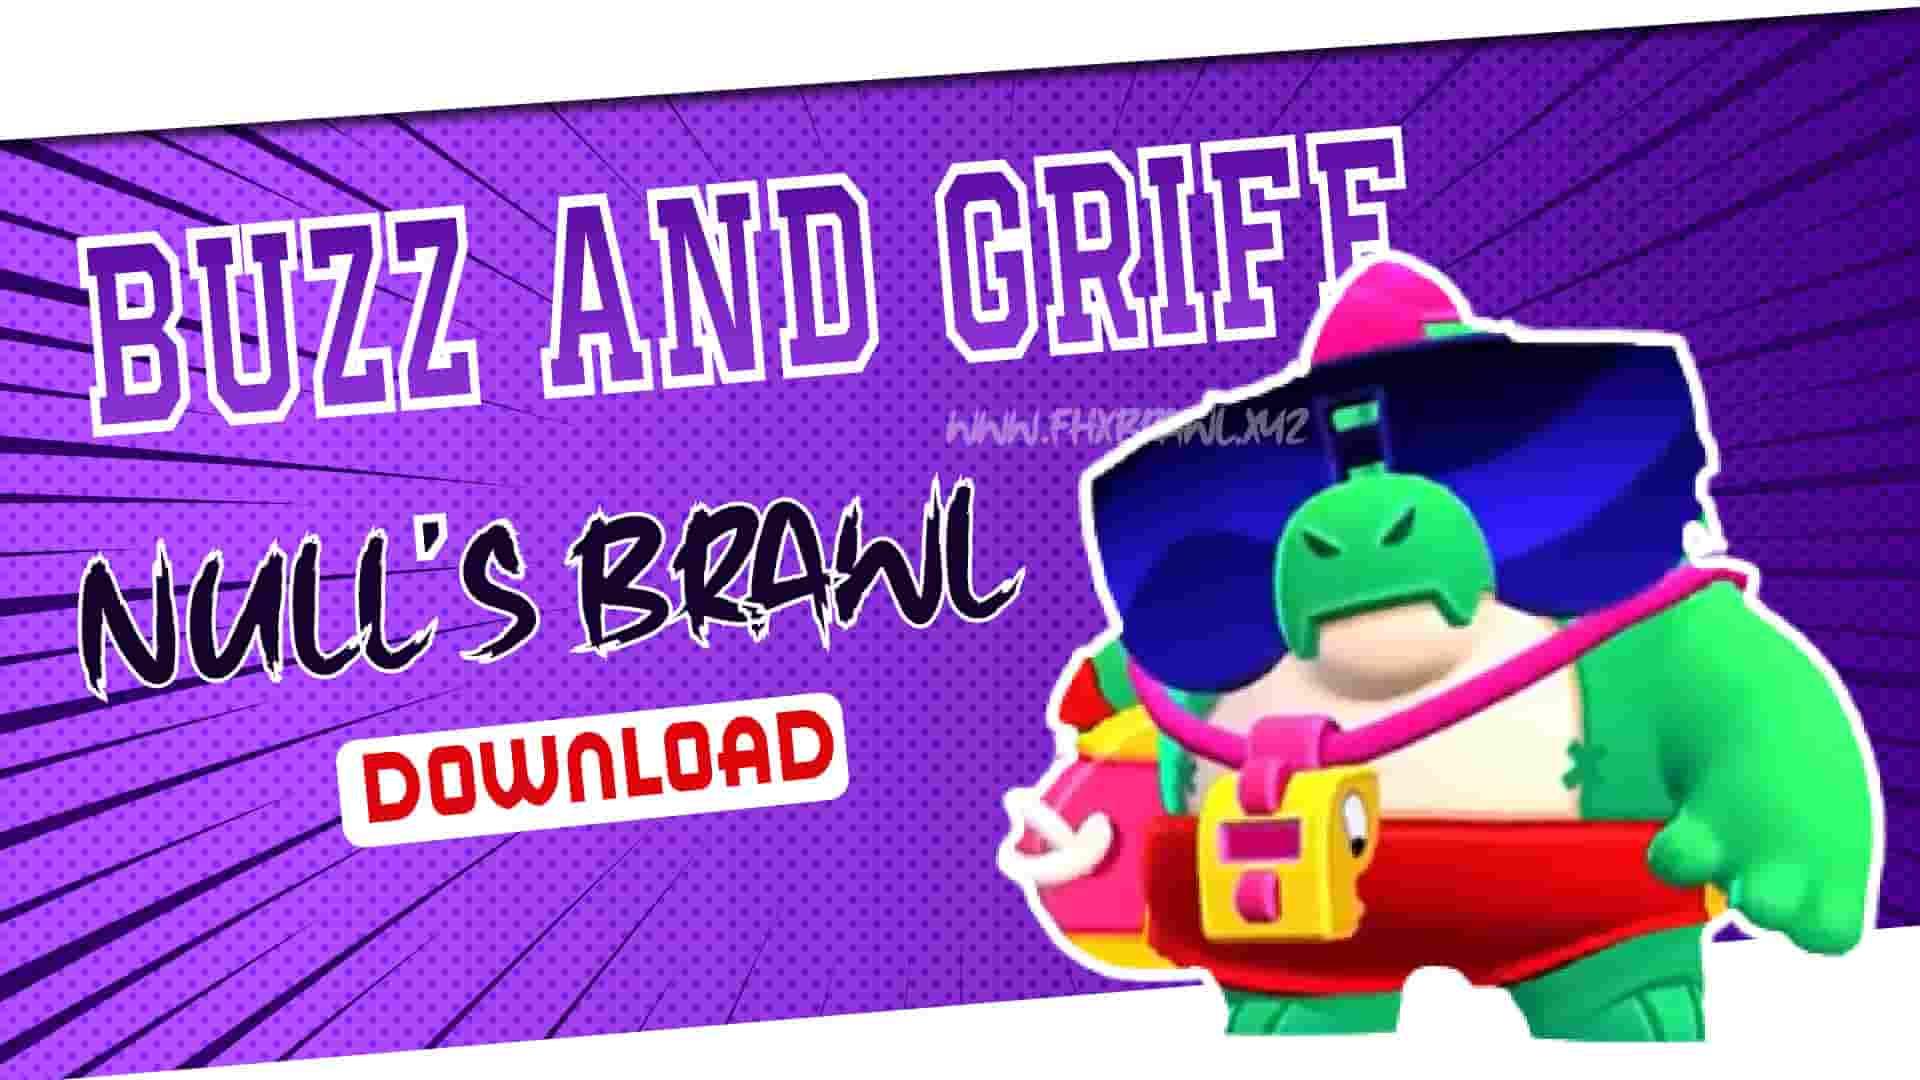 Nulls Brawl Buzz Download